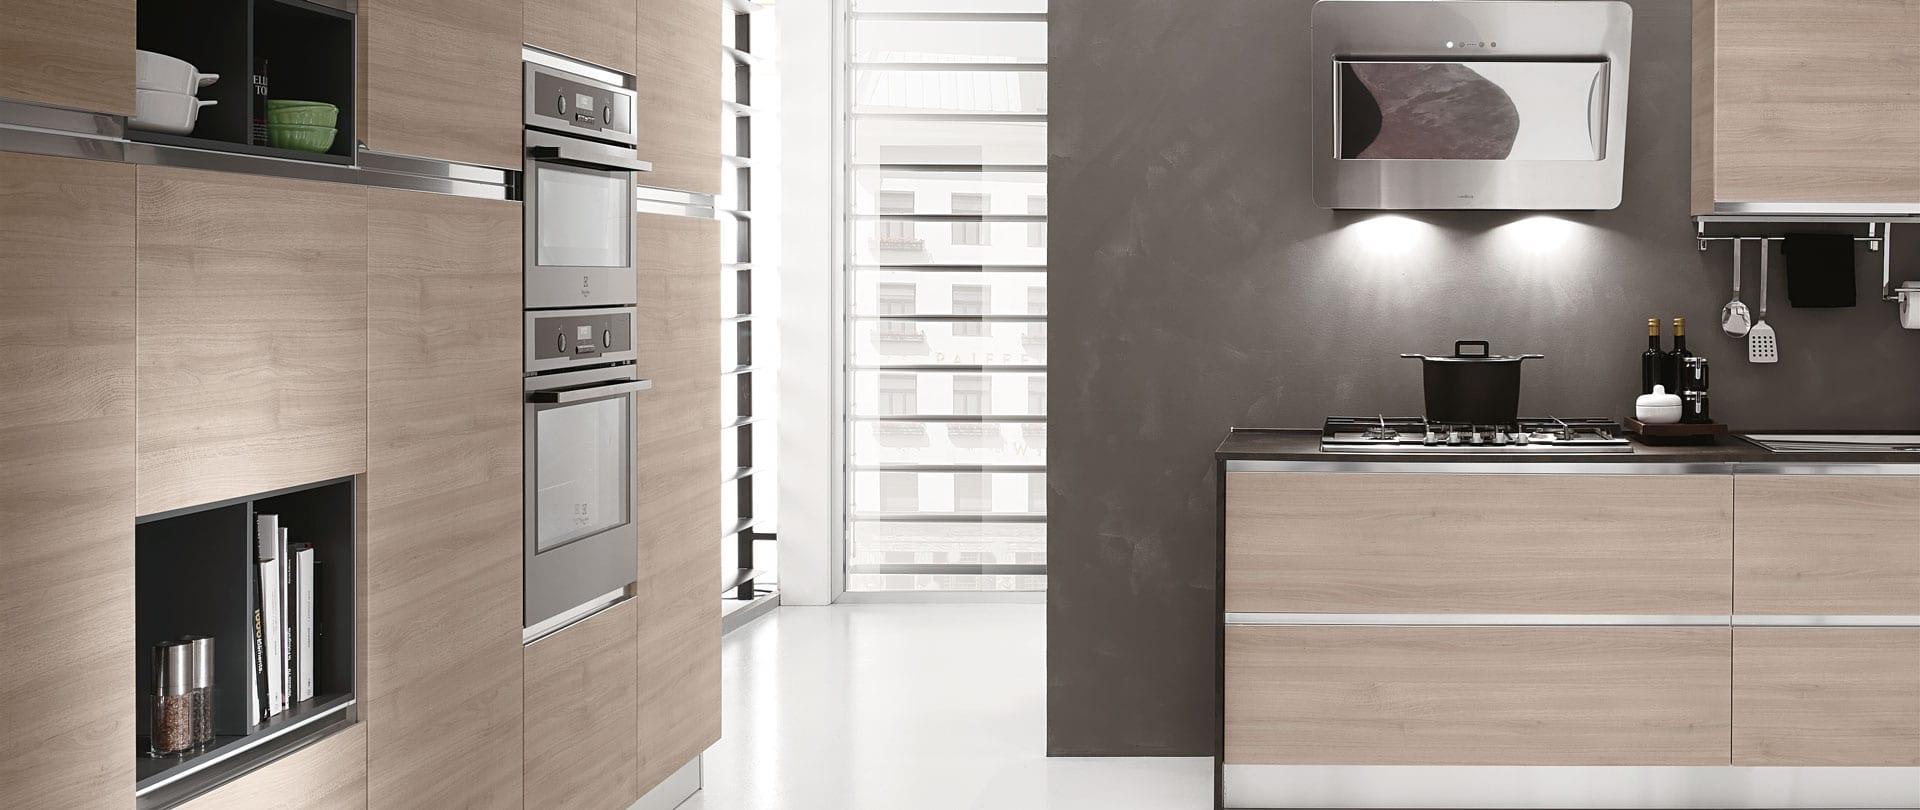 05-cucina-moderna-newmeg-tranche-naturale